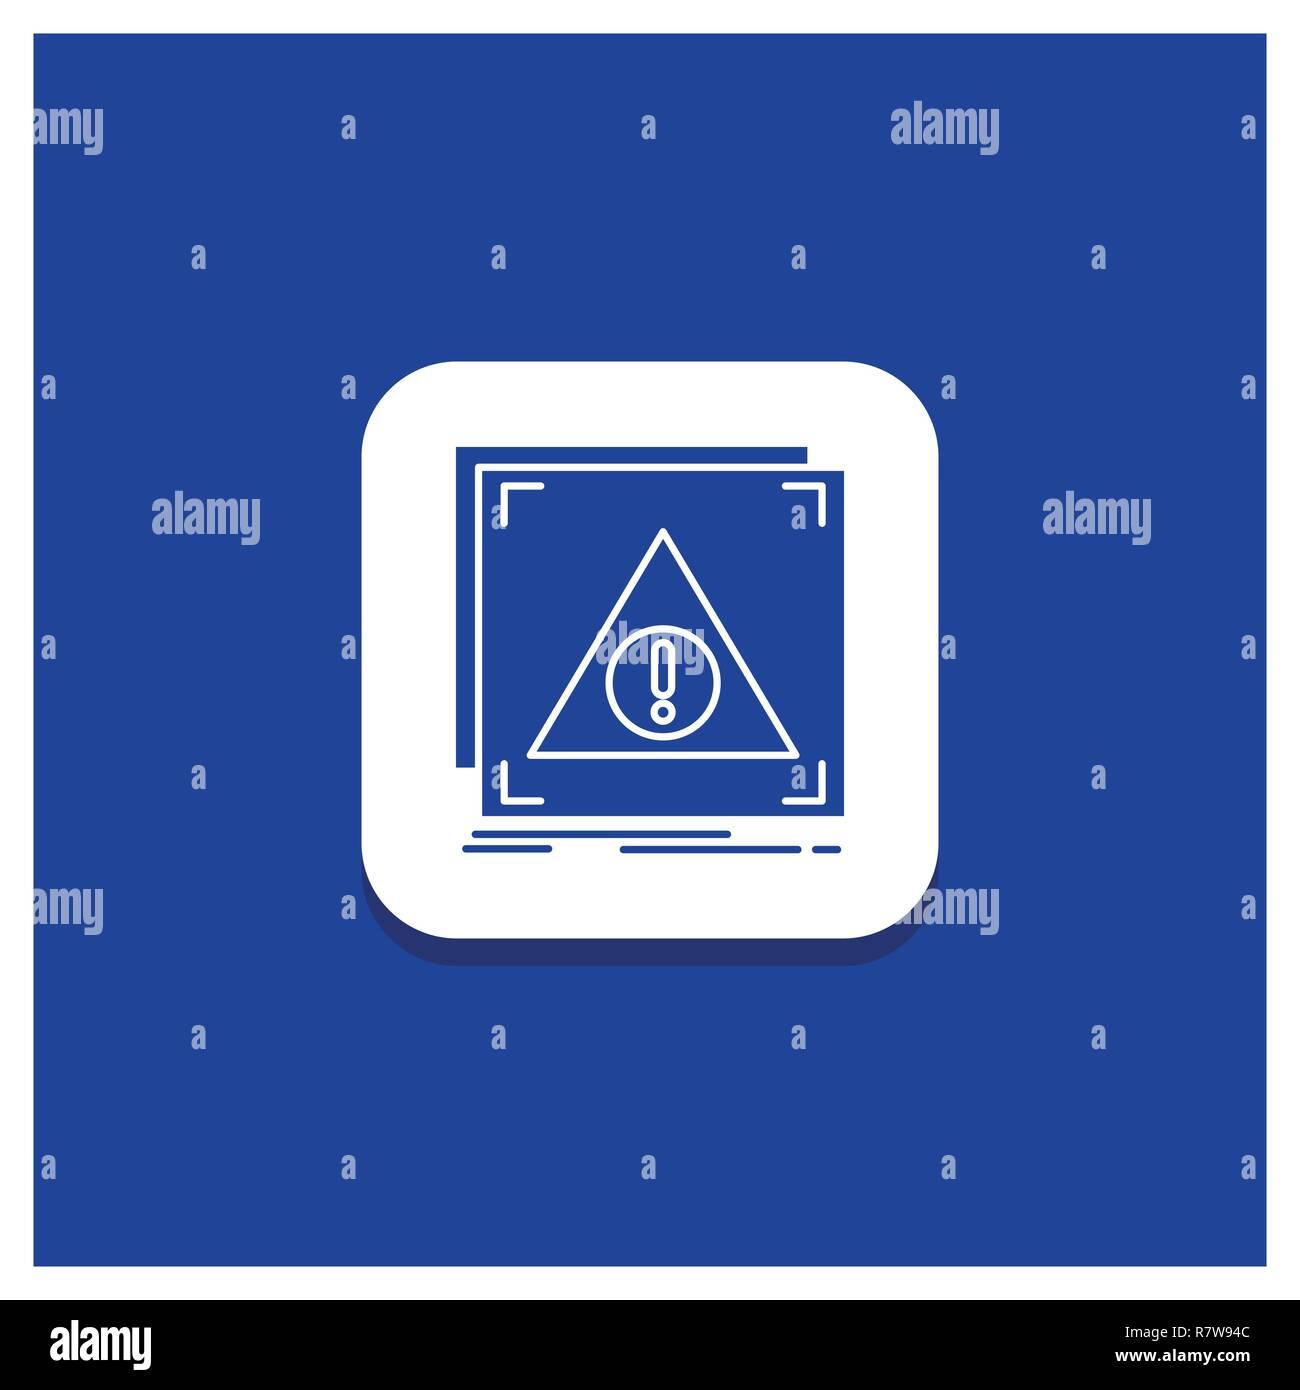 Blue Round Button for Error, Application, Denied, server, alert Glyph icon - Stock Image